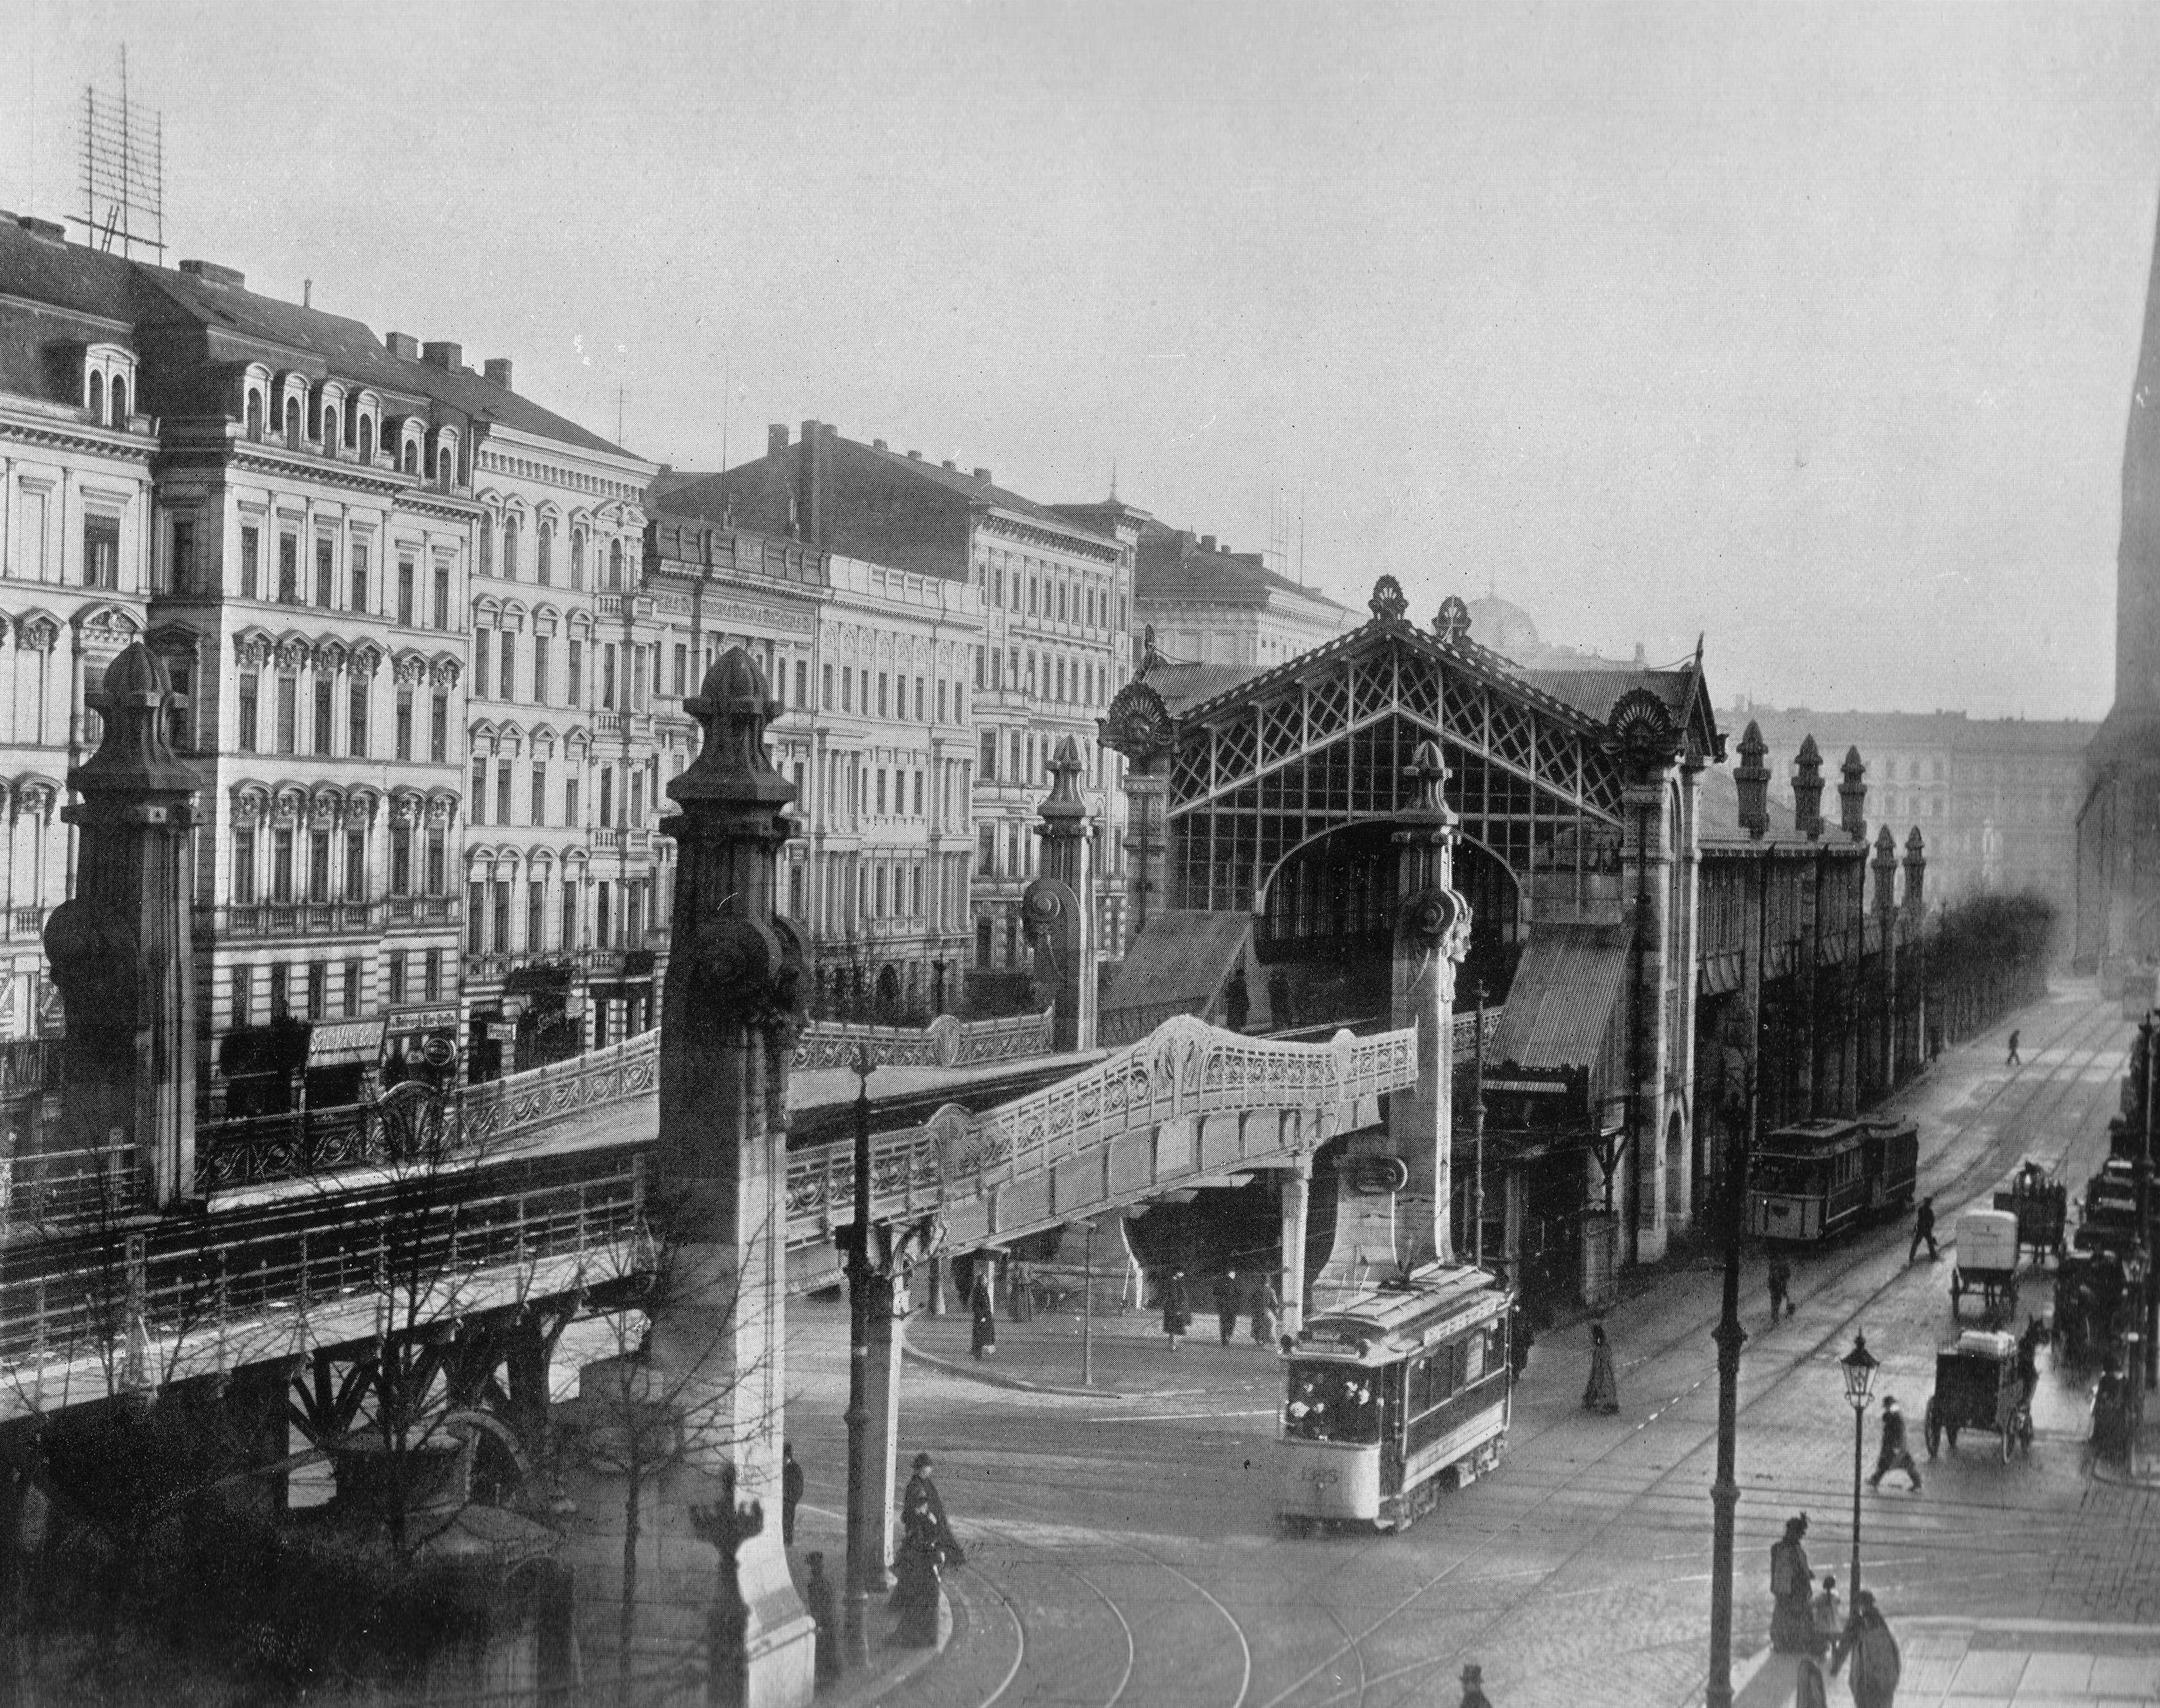 The Elevated Station Bulowstrasse In 1903 Bahn Berlin Berlin Ubahn U Bahn